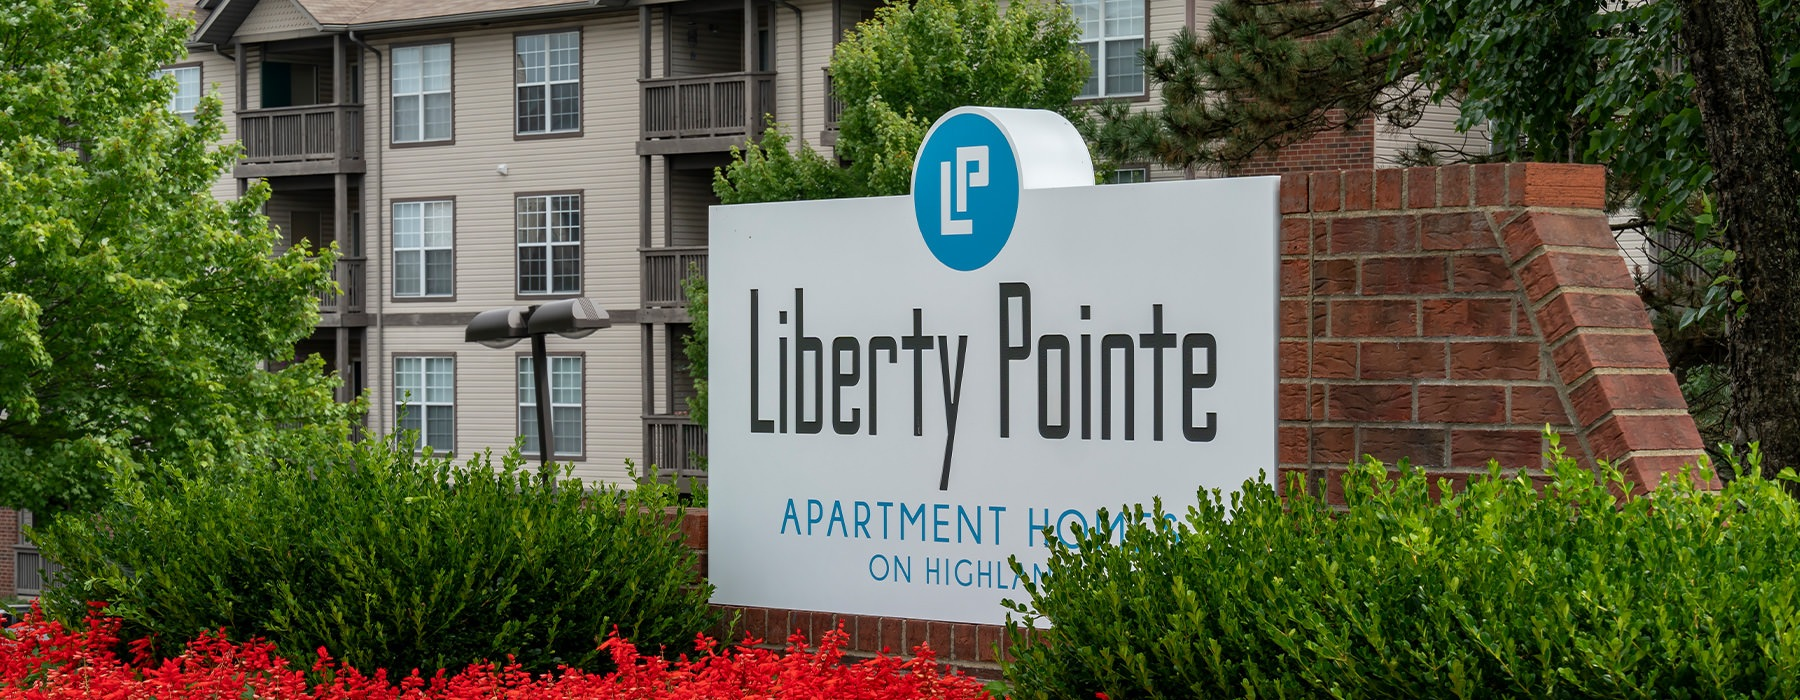 Liberty Pointe apartment entrance